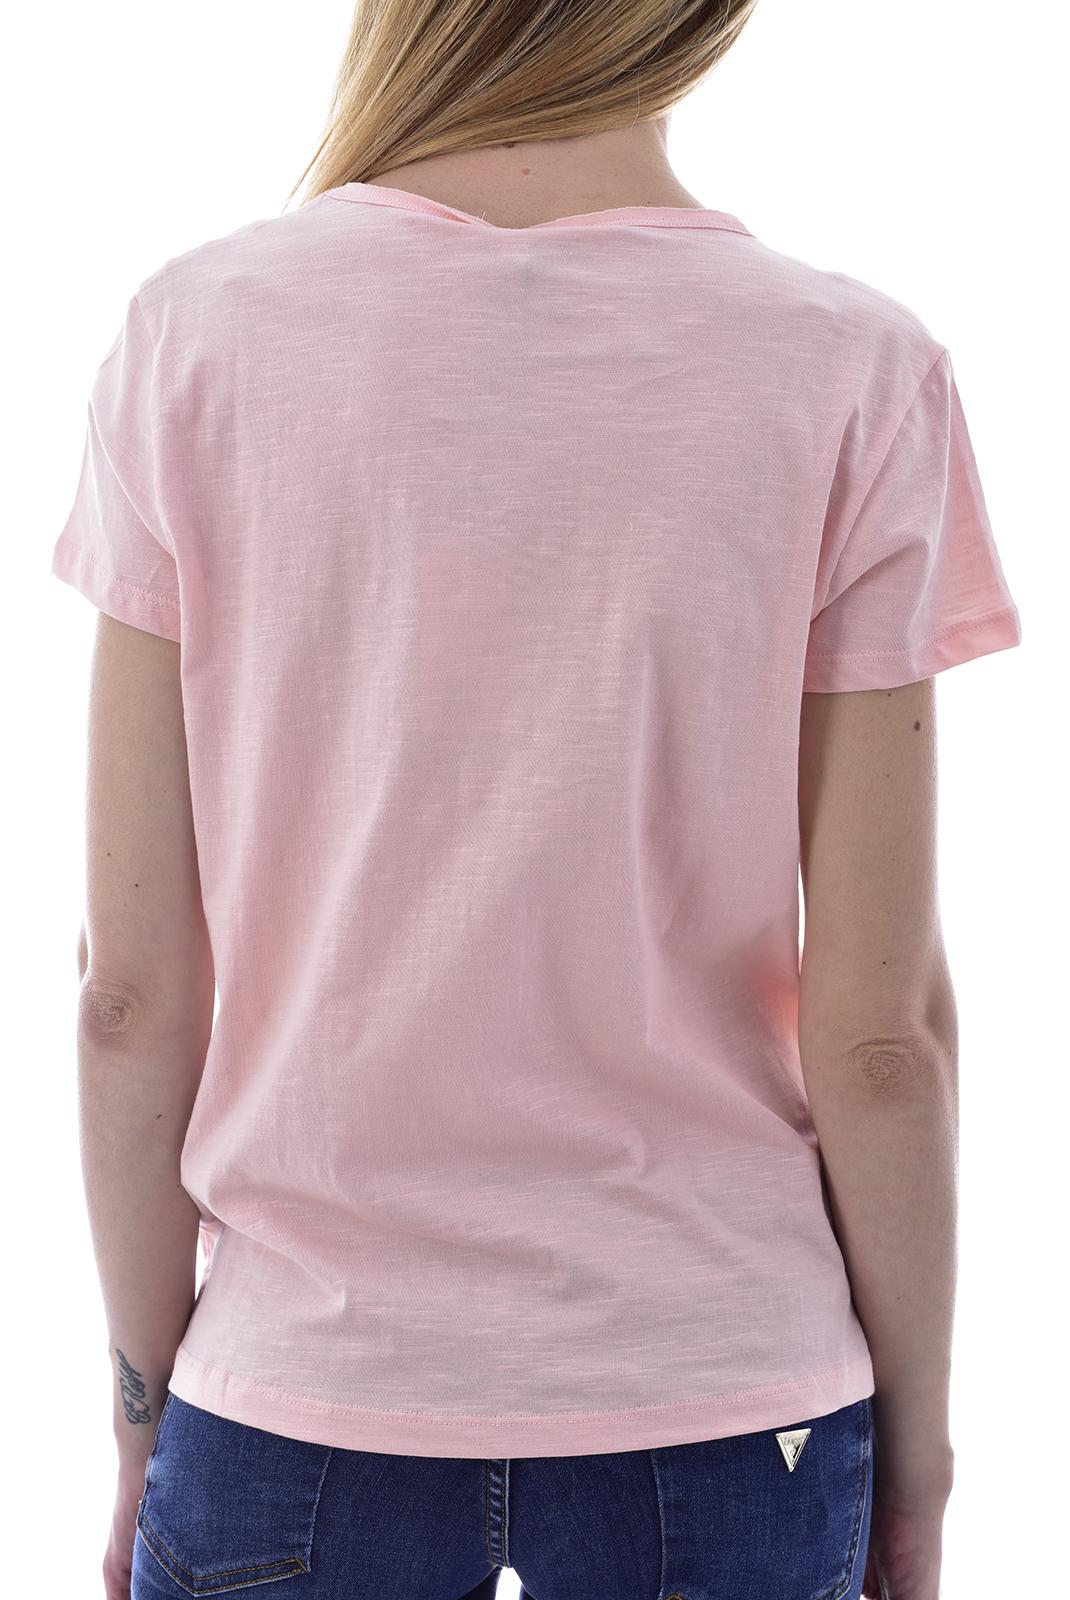 Tee shirt  Kaporal BEWEL ORCHID